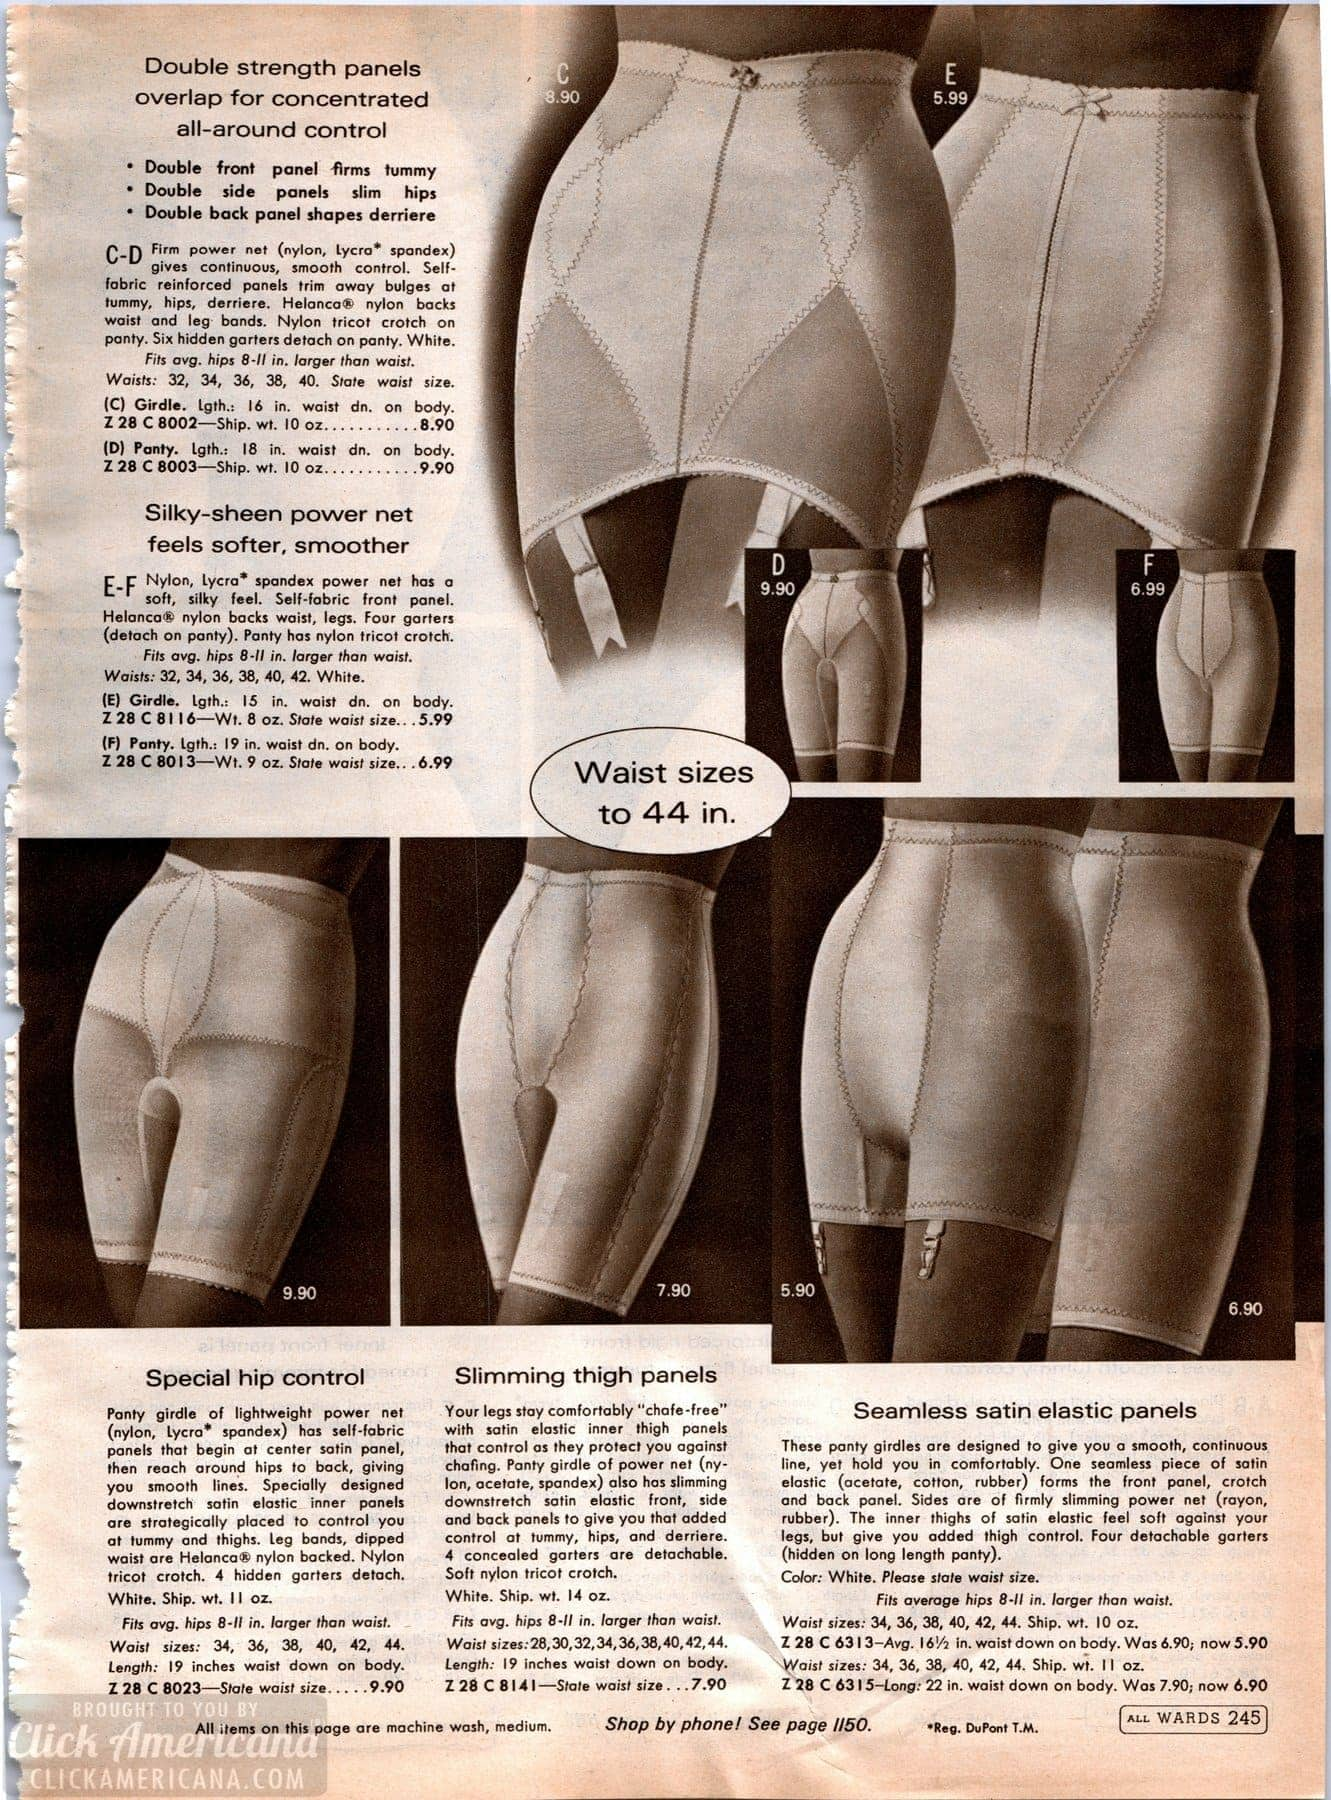 Pantyhose with pantygirdles